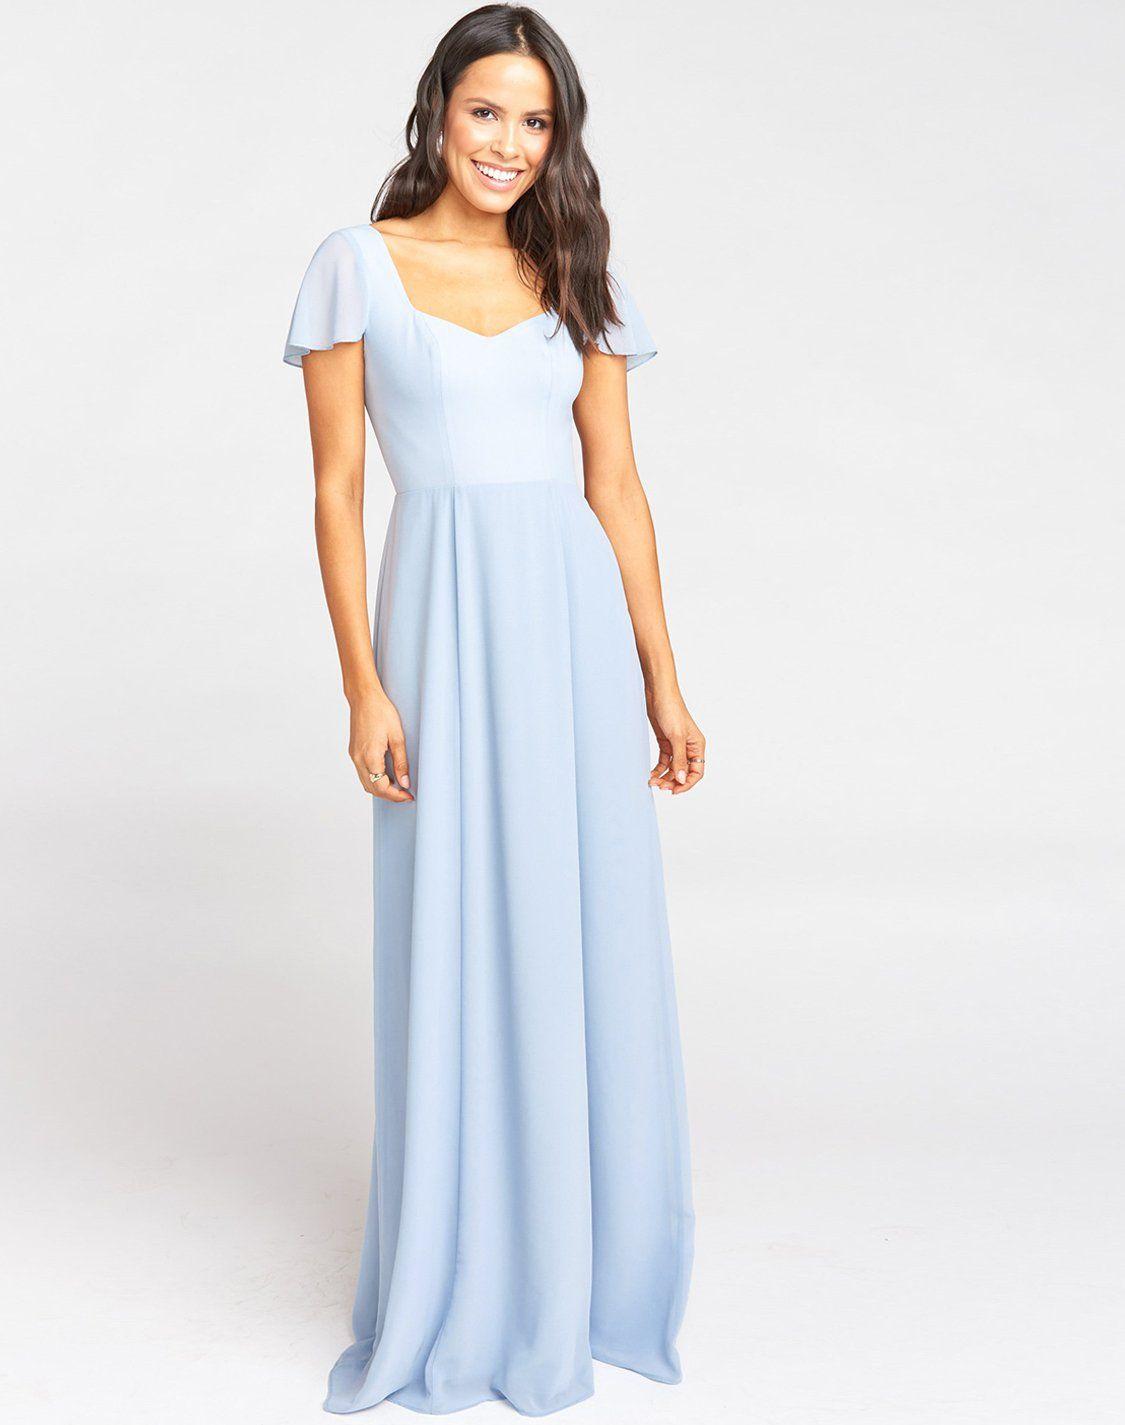 Marie Sweetheart Maxi Dress Steel Blue Chiffon In 2021 Powder Blue Bridesmaid Dress Blue Bridesmaid Dresses Bridesmaid Dresses [ 1425 x 1125 Pixel ]